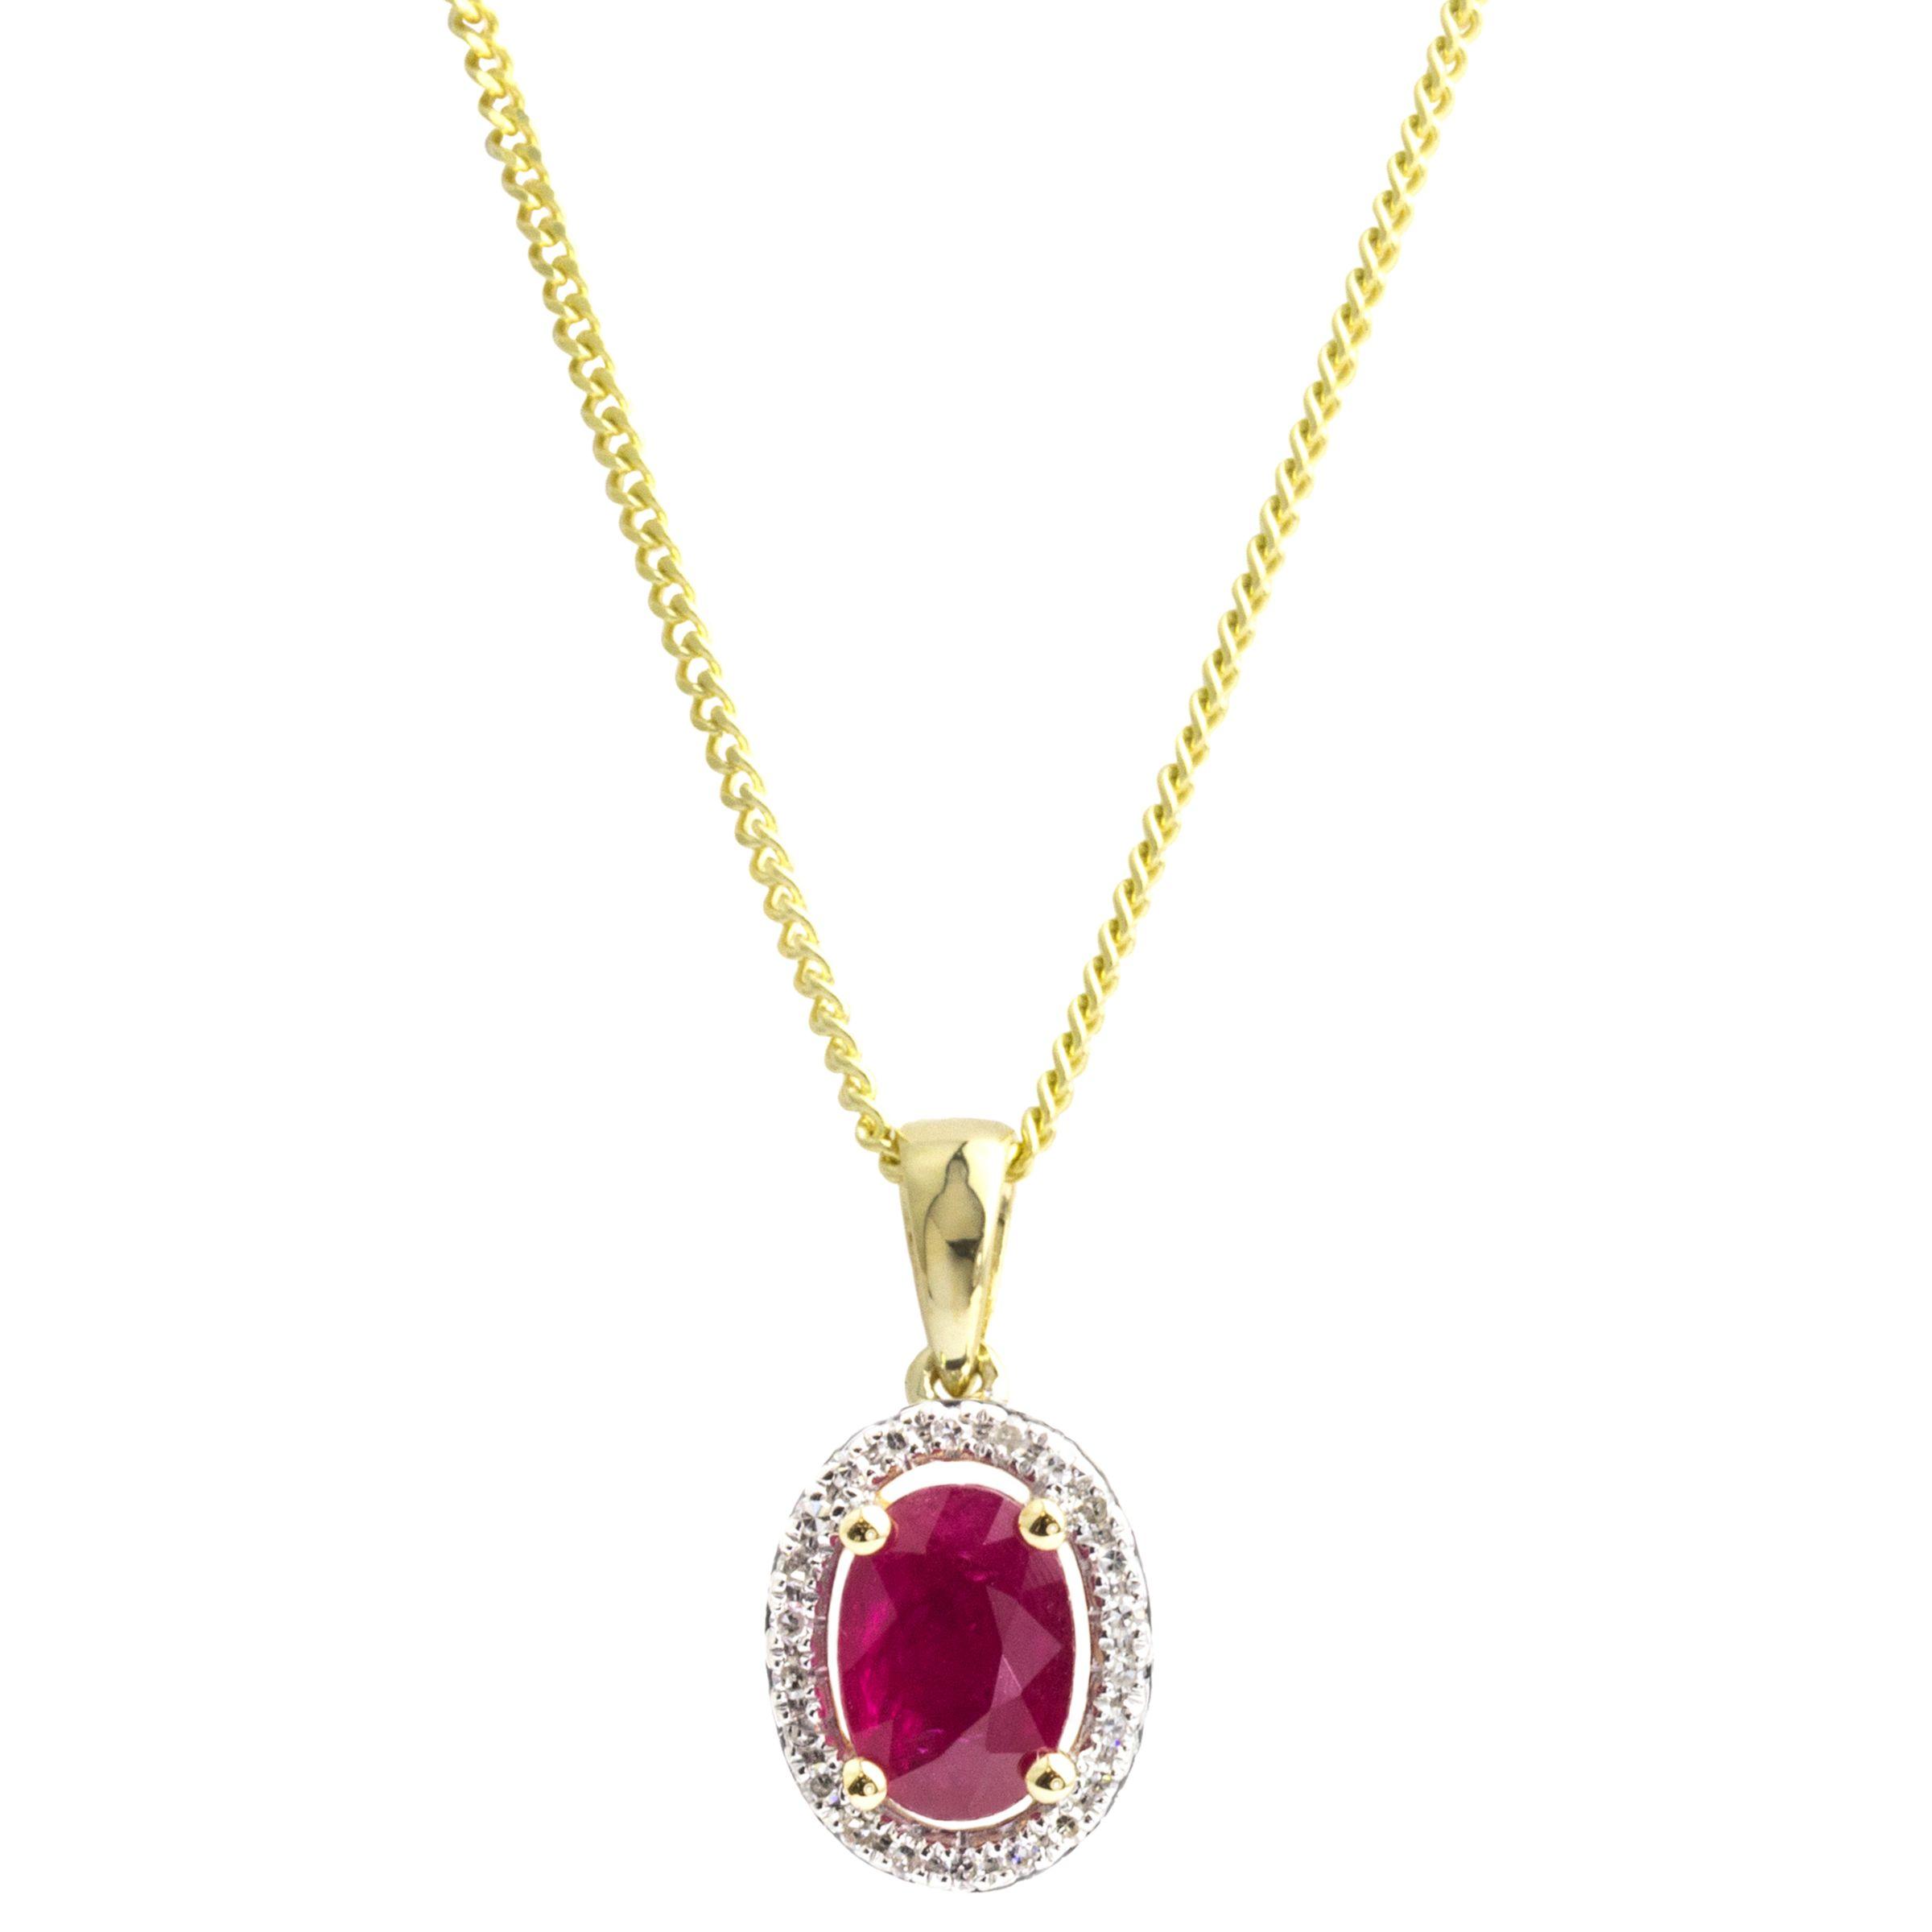 A B Davis A B Davis 9ct Gold Ruby and Diamond Oval Pendant Necklace